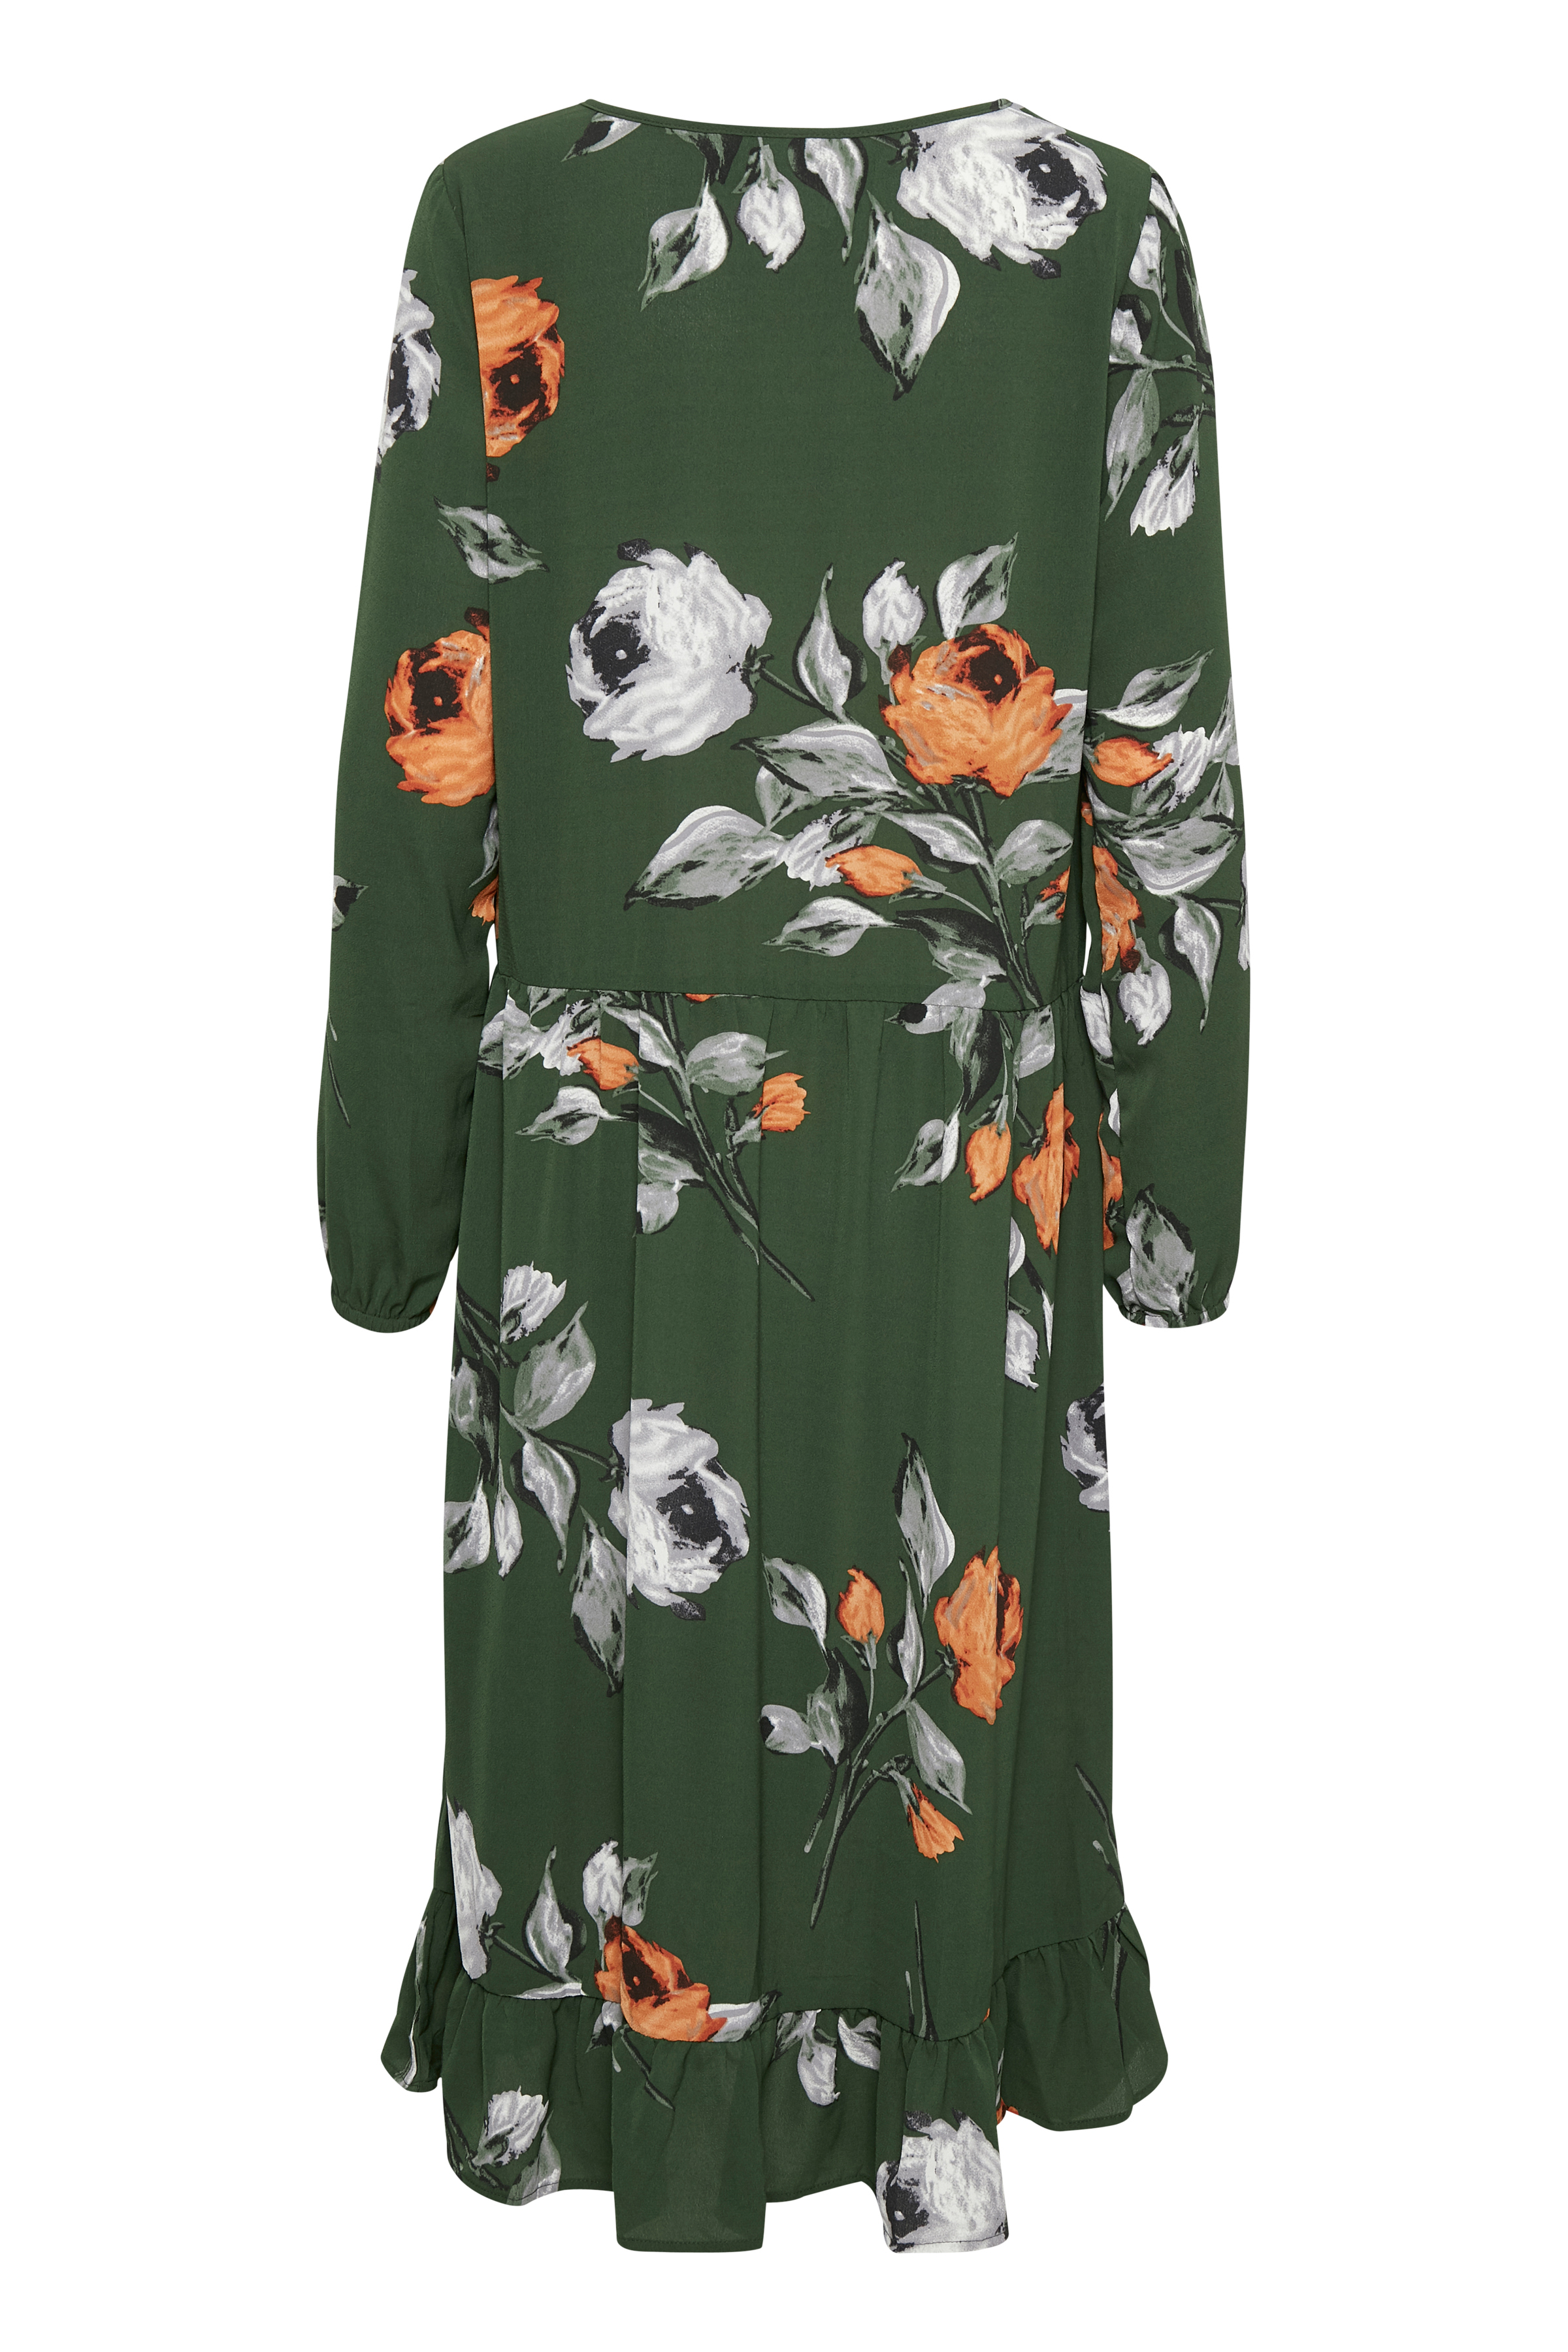 Olivgrün/grau Kleid von Kaffe – Shoppen SieOlivgrün/grau Kleid ab Gr. 34-46 hier